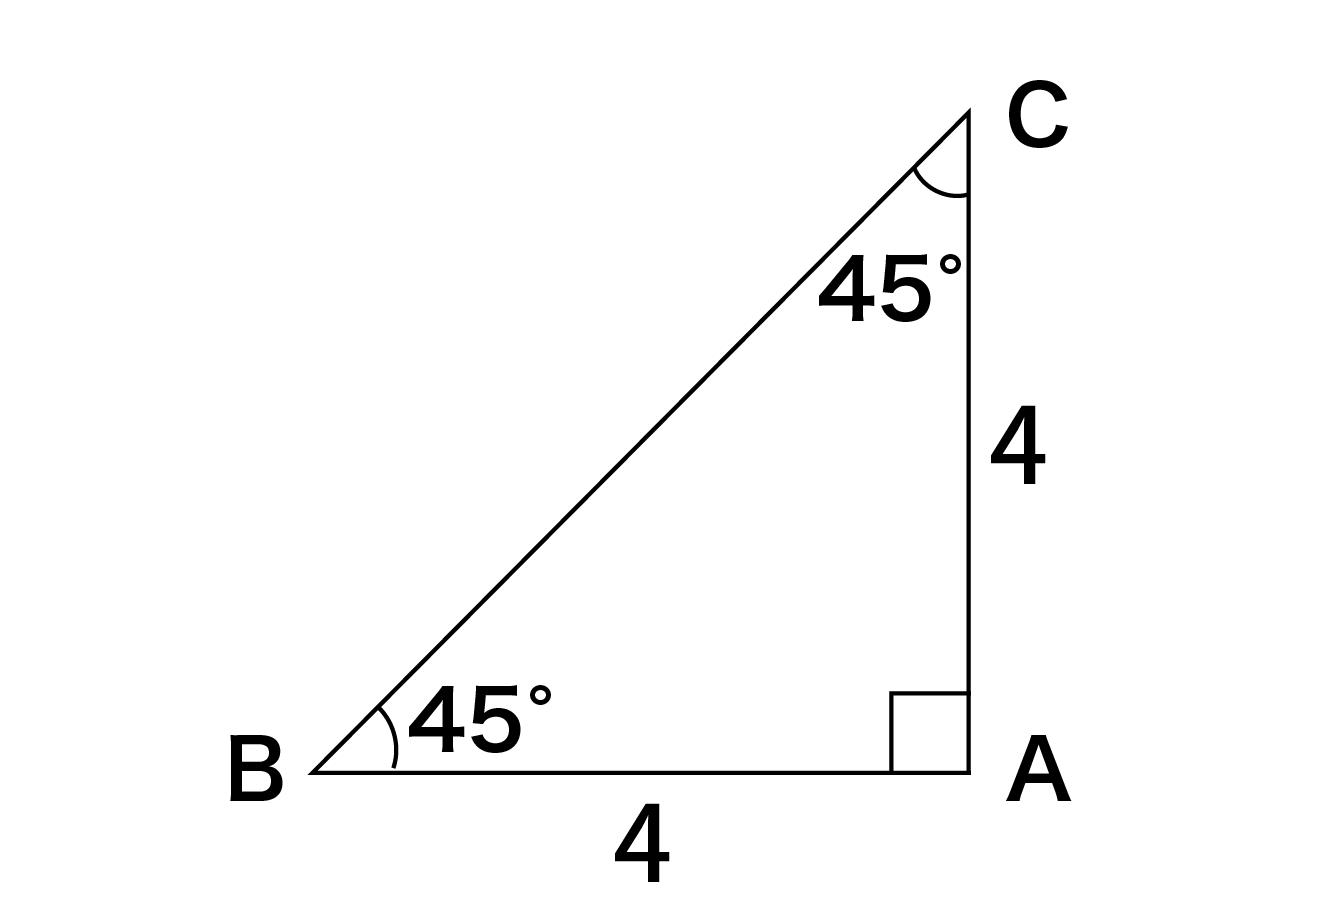 AB=4の直角二等辺三角形